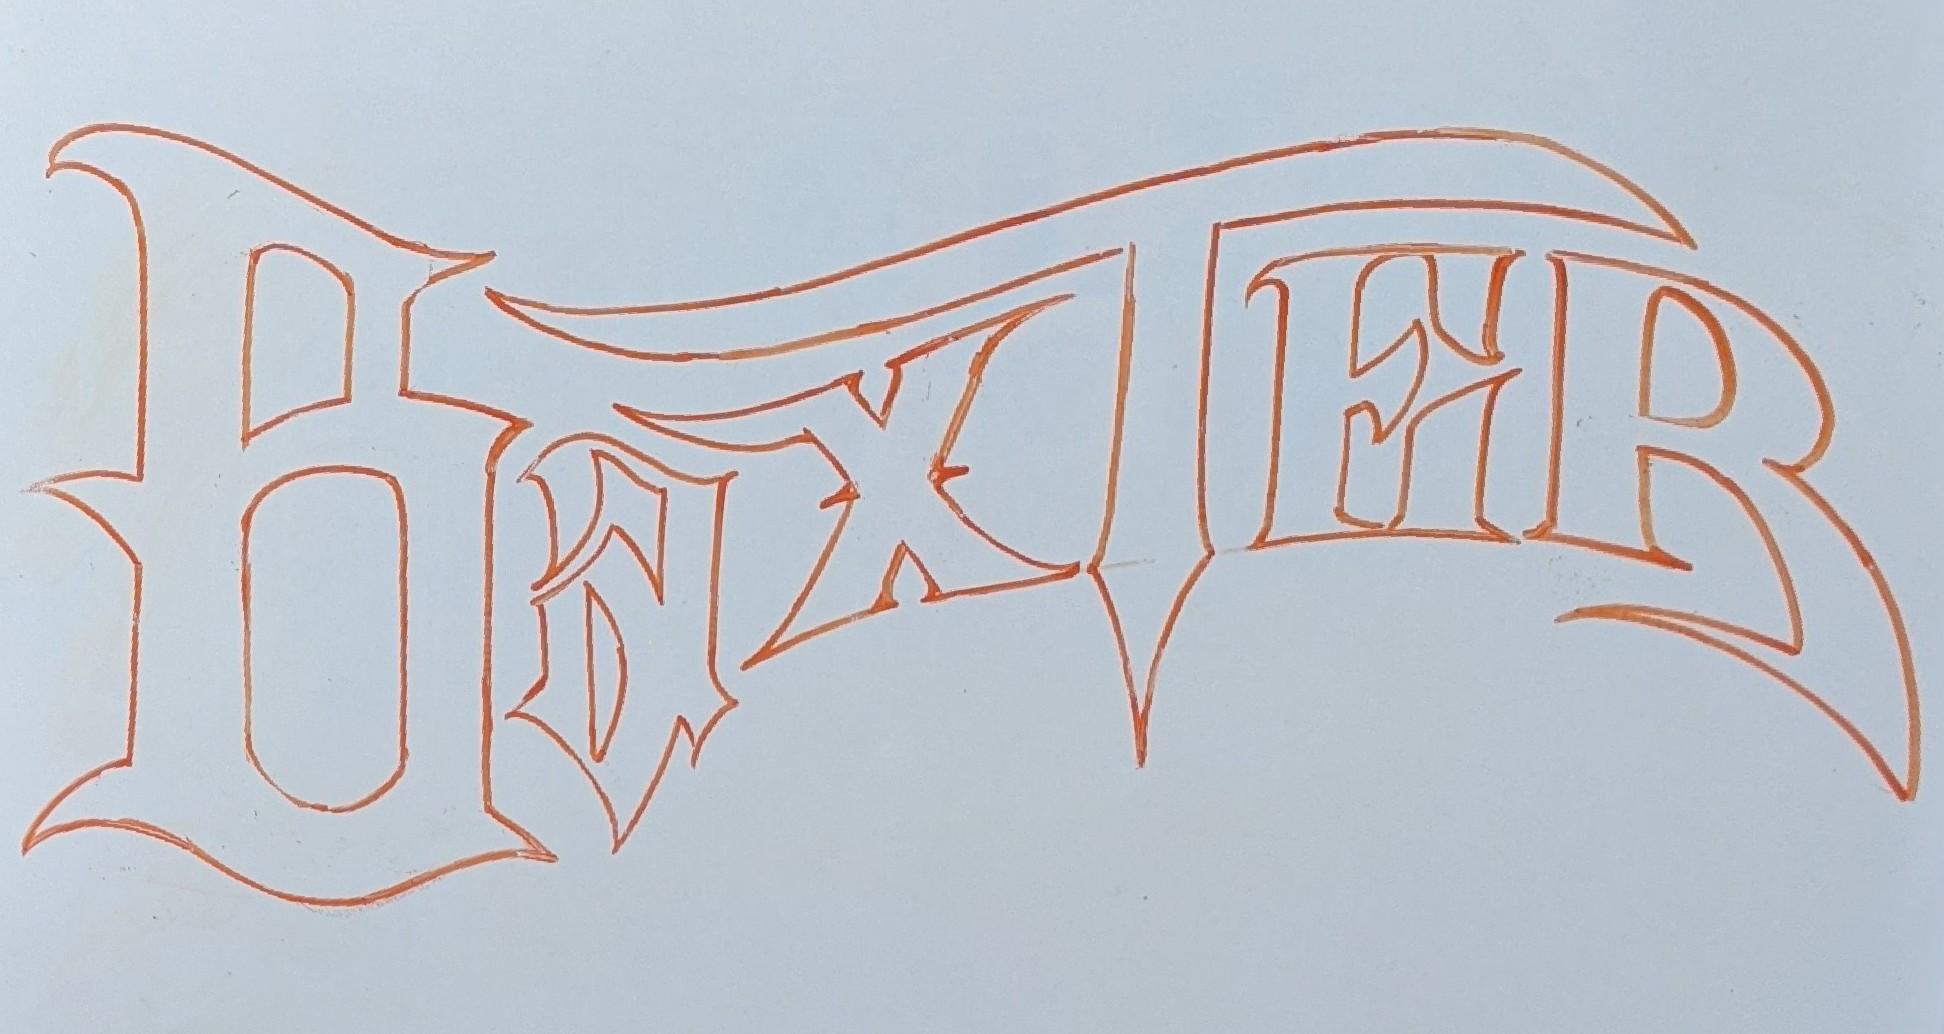 PXL_20210502_191003821.MP~2.jpg